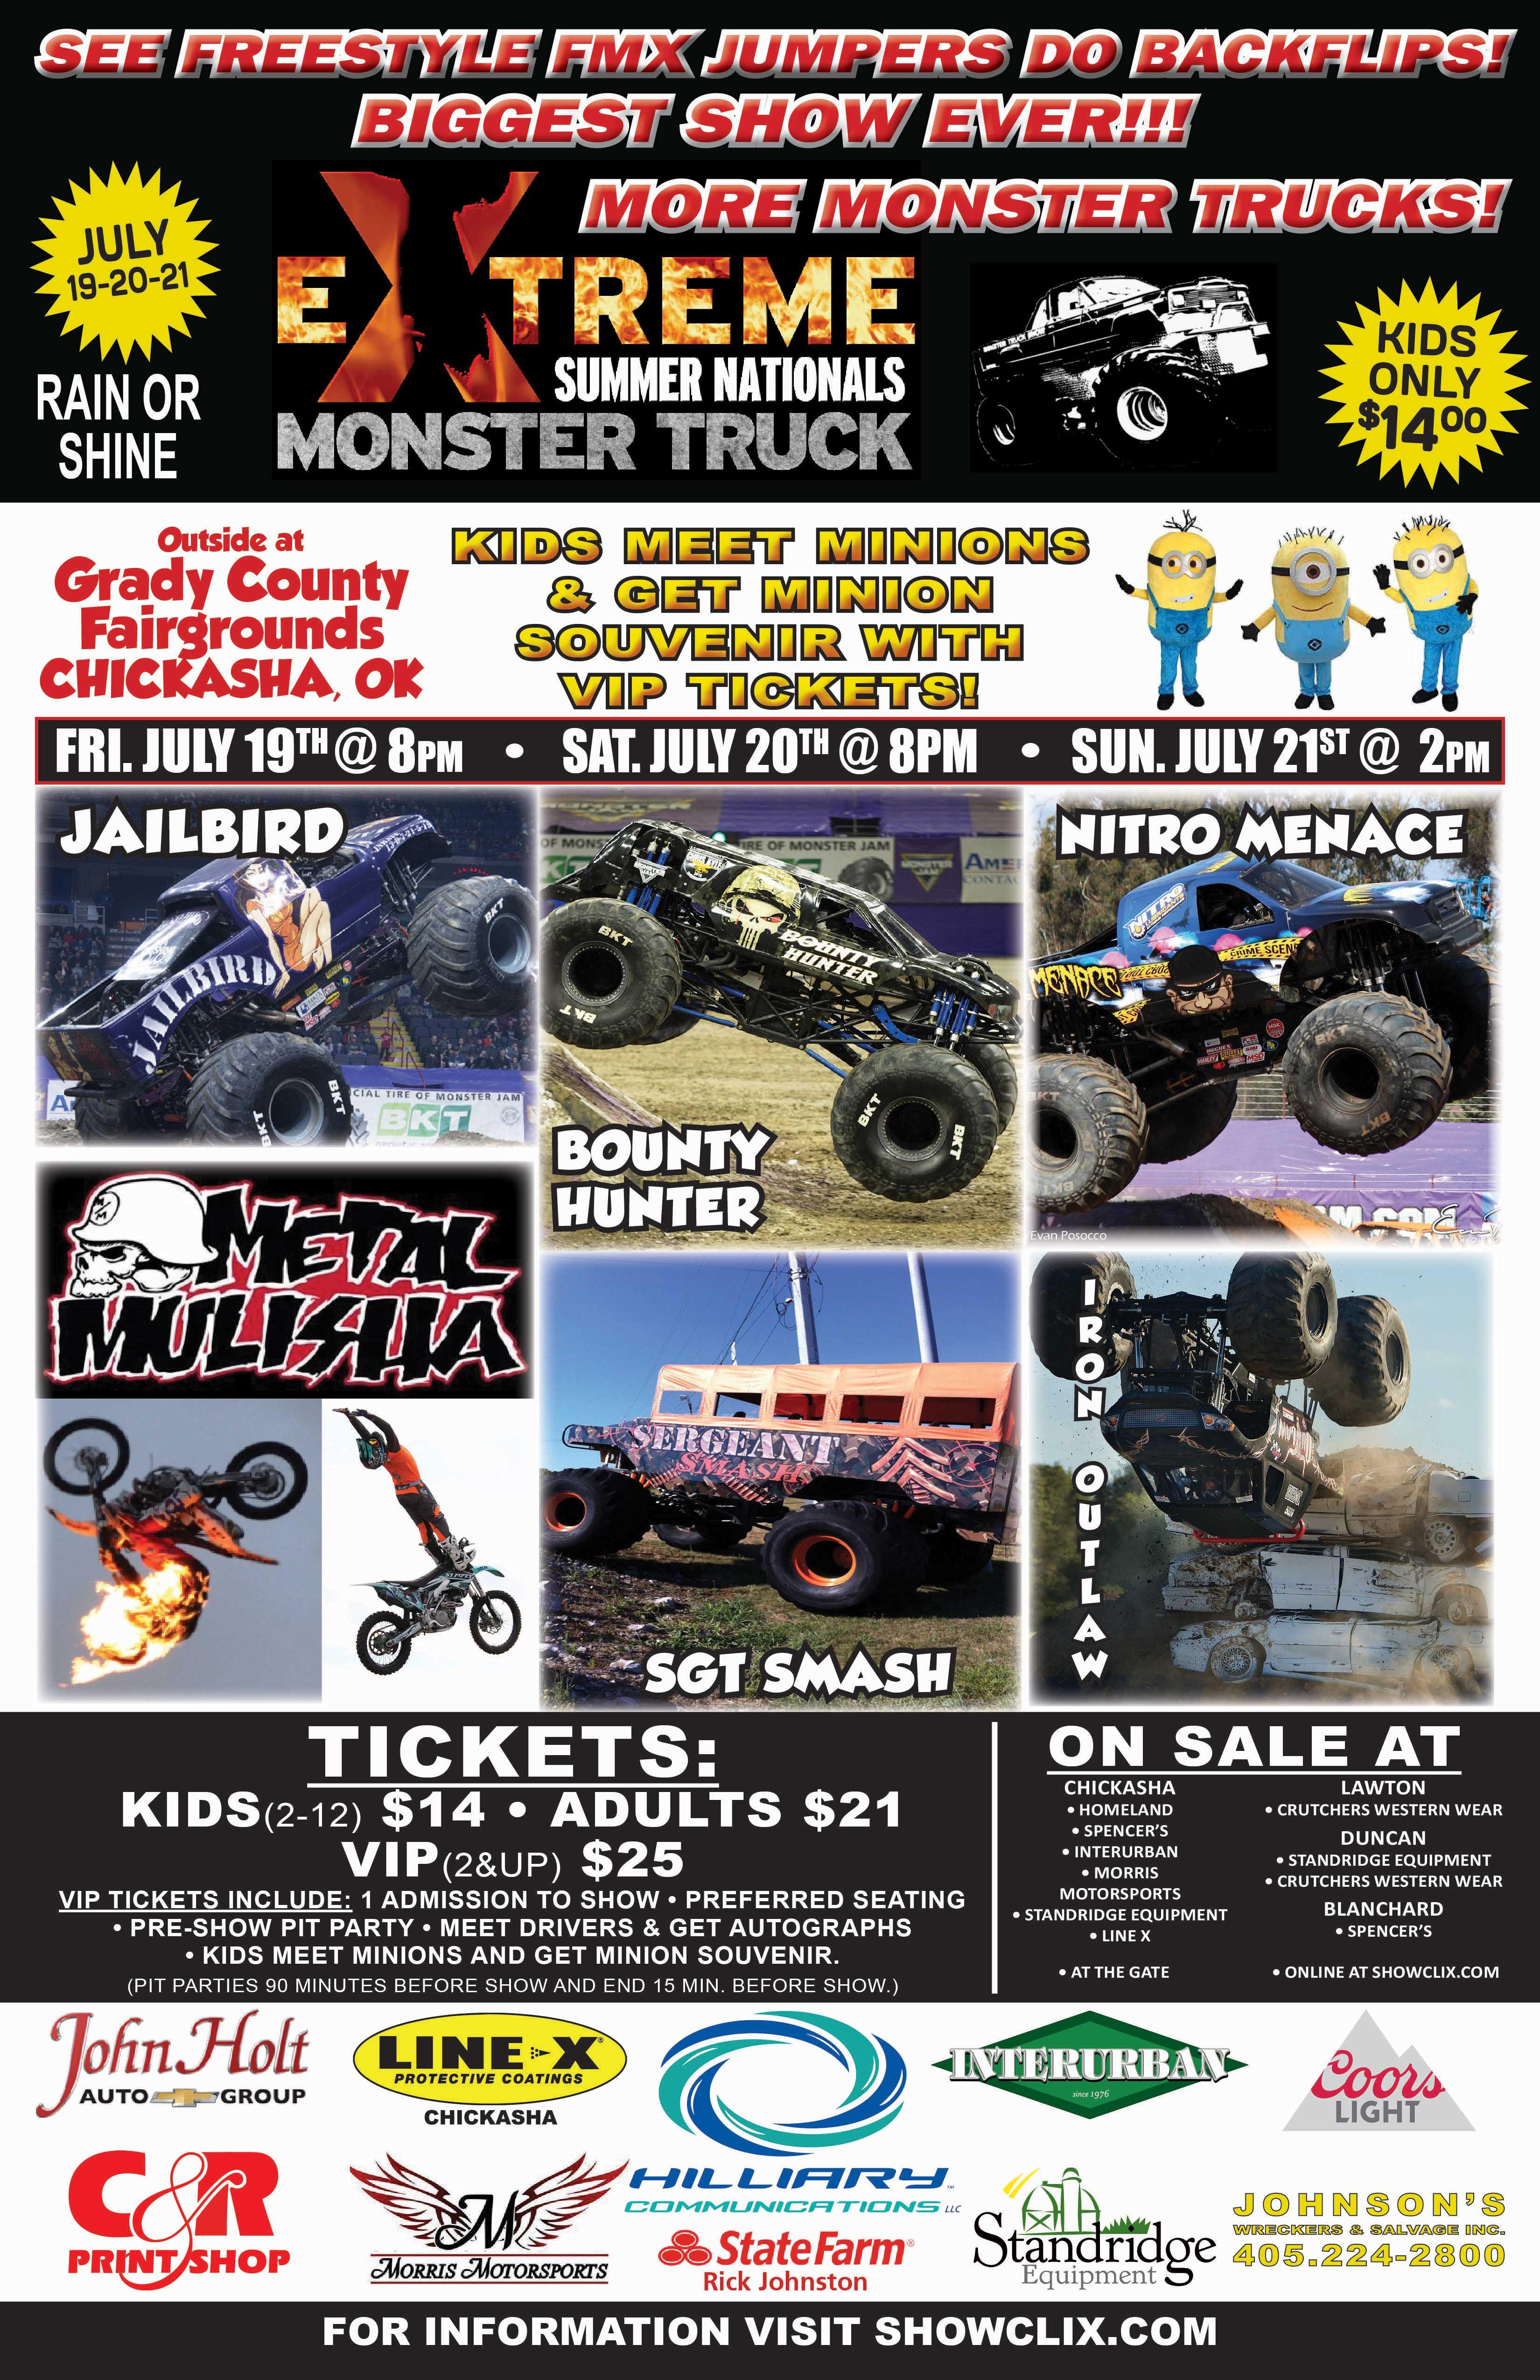 Tickets for MONSTER TRUCK SUMMER NATIONALS CHICKASHA OK